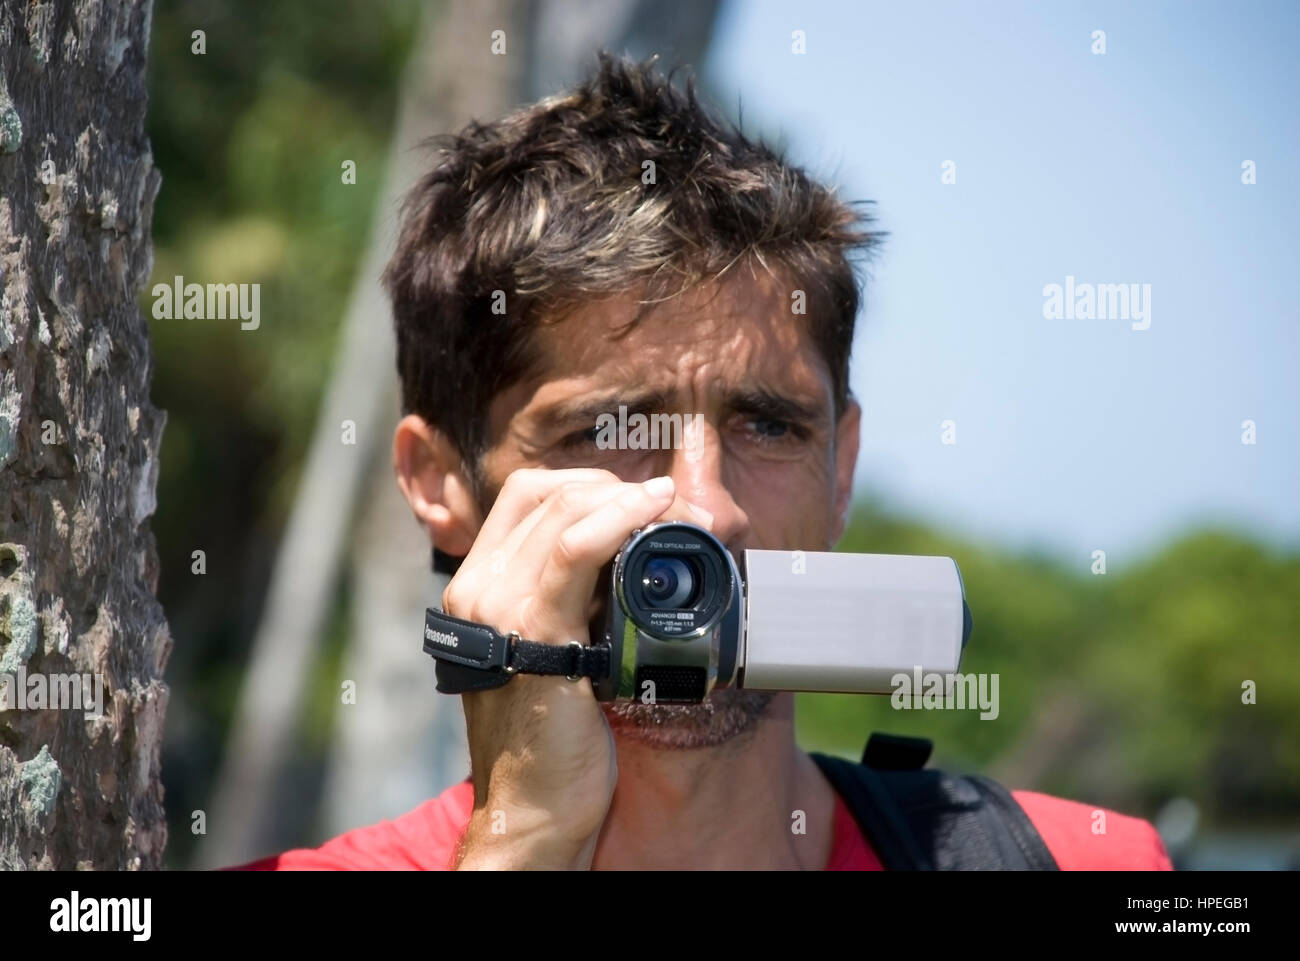 Model released , Mann filmt mit Videokamera - man with video cam - Stock Image